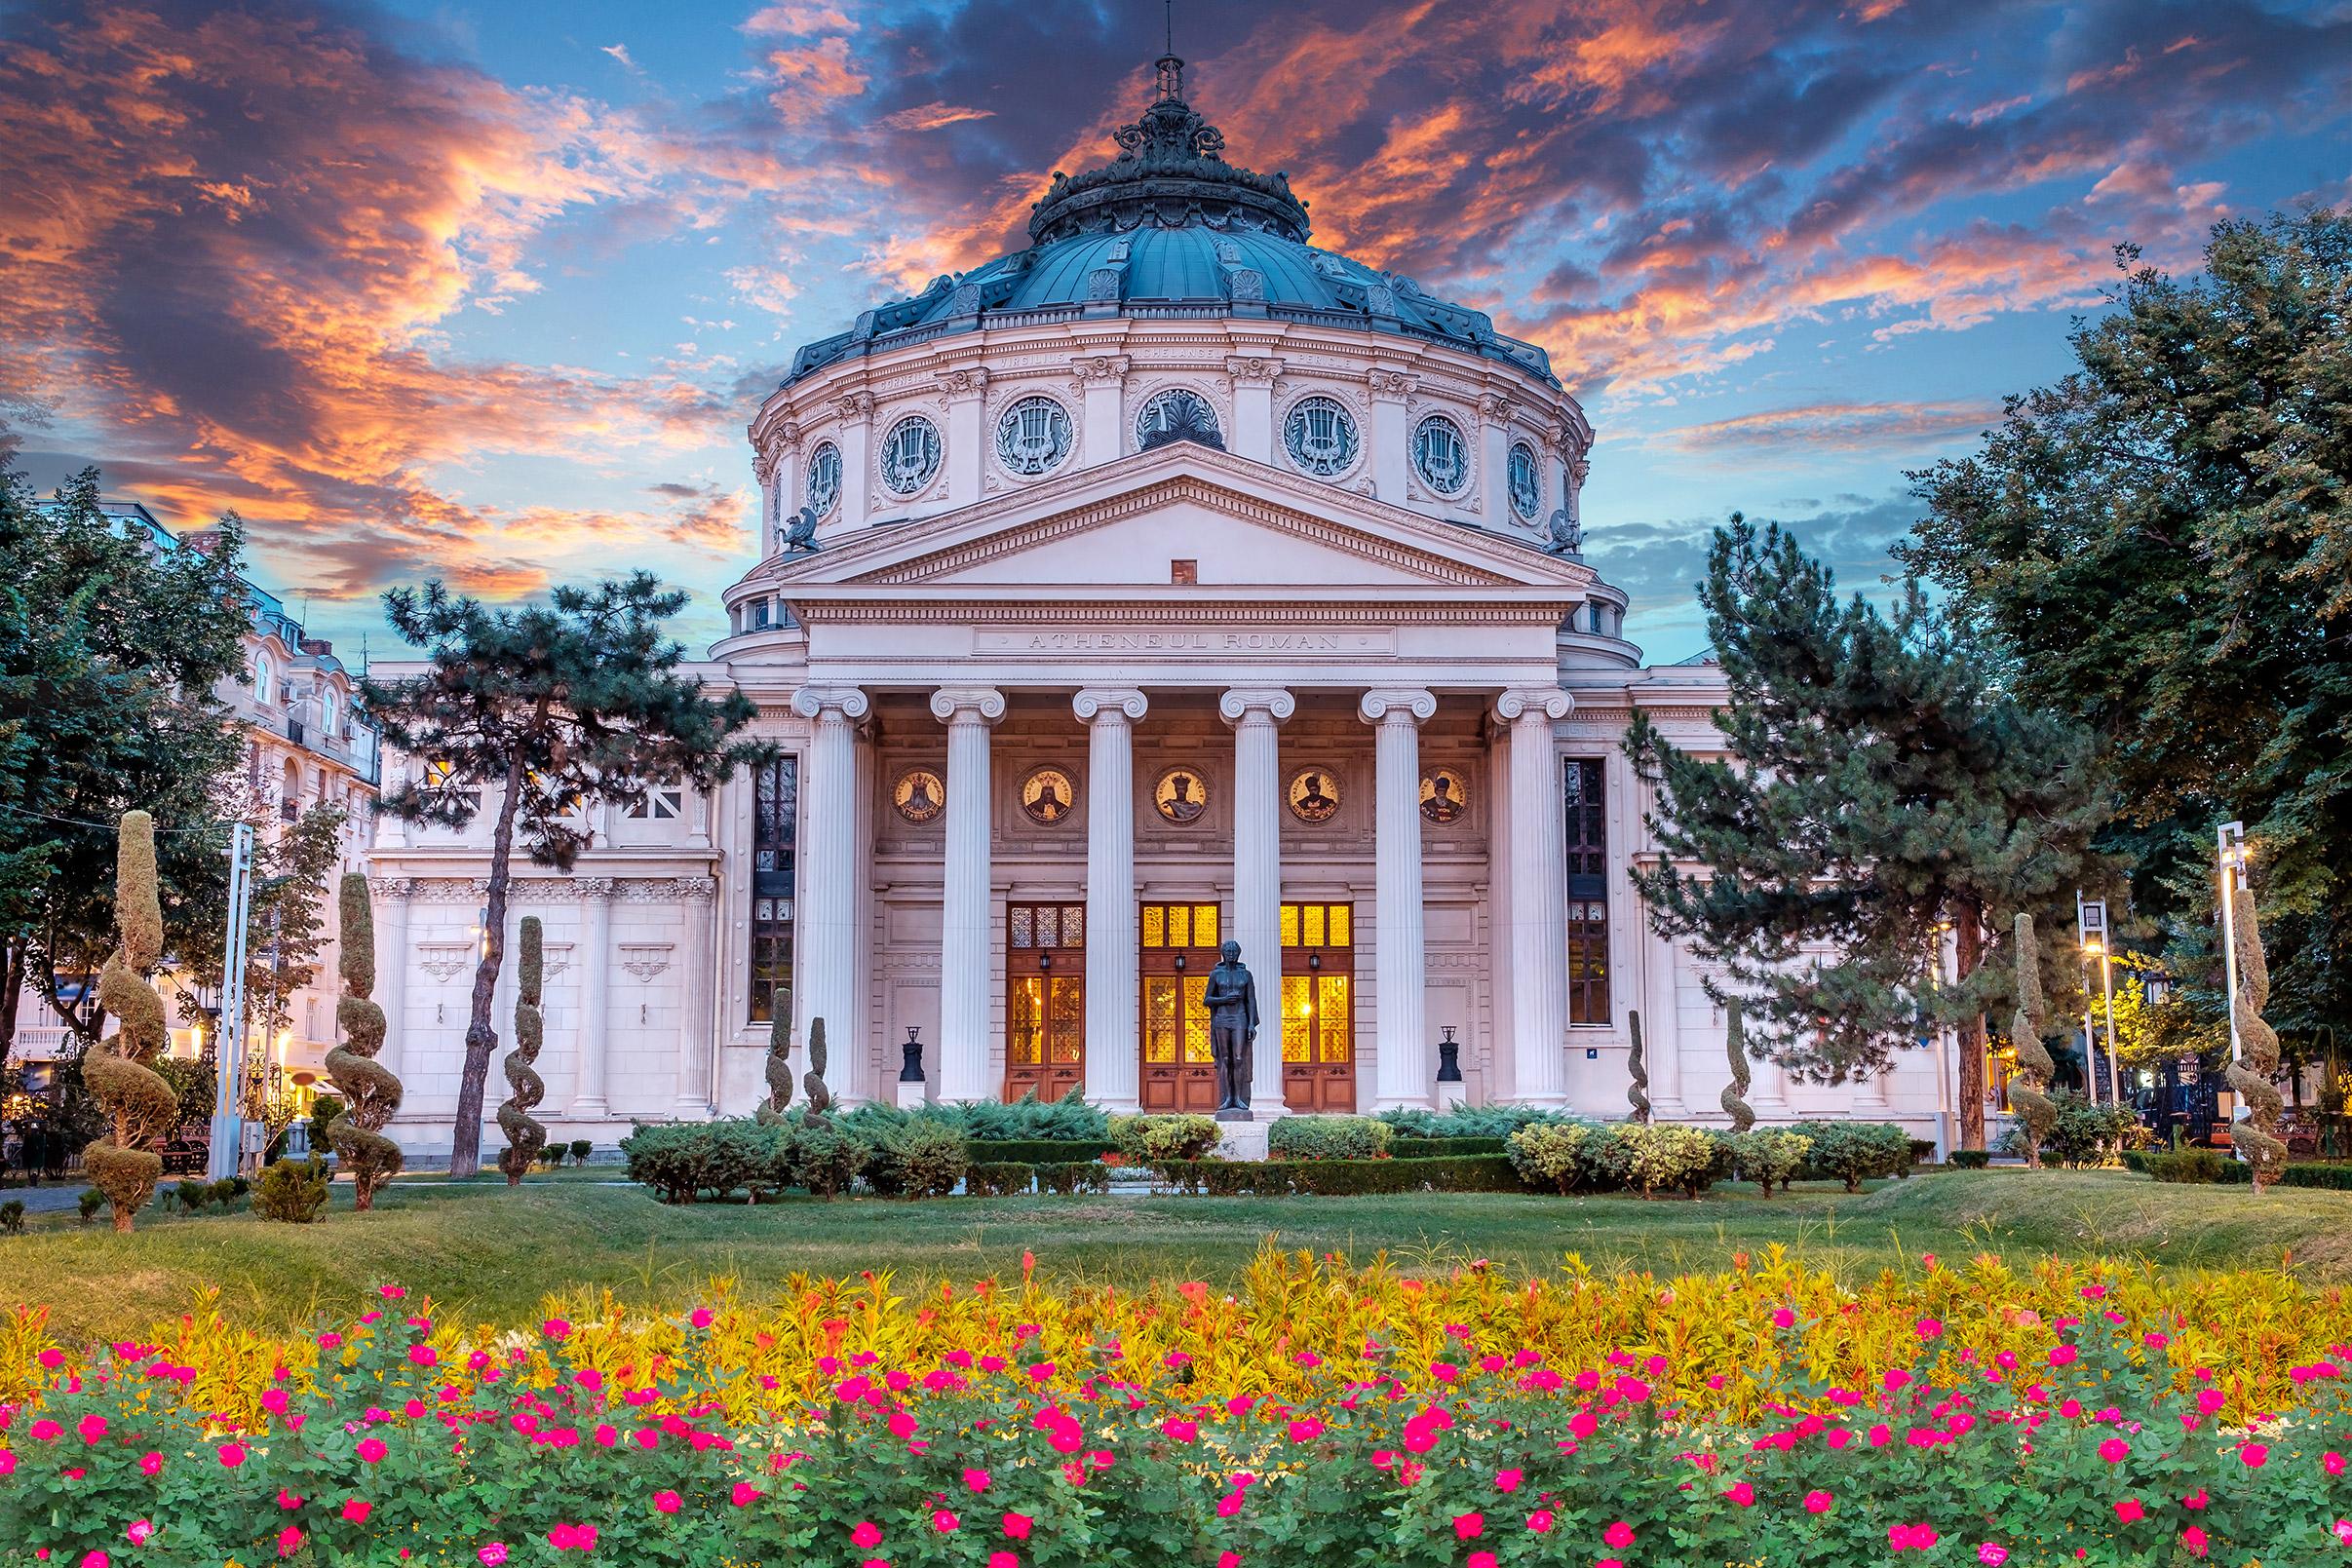 Romania Bucharest Romanian Athenaeum